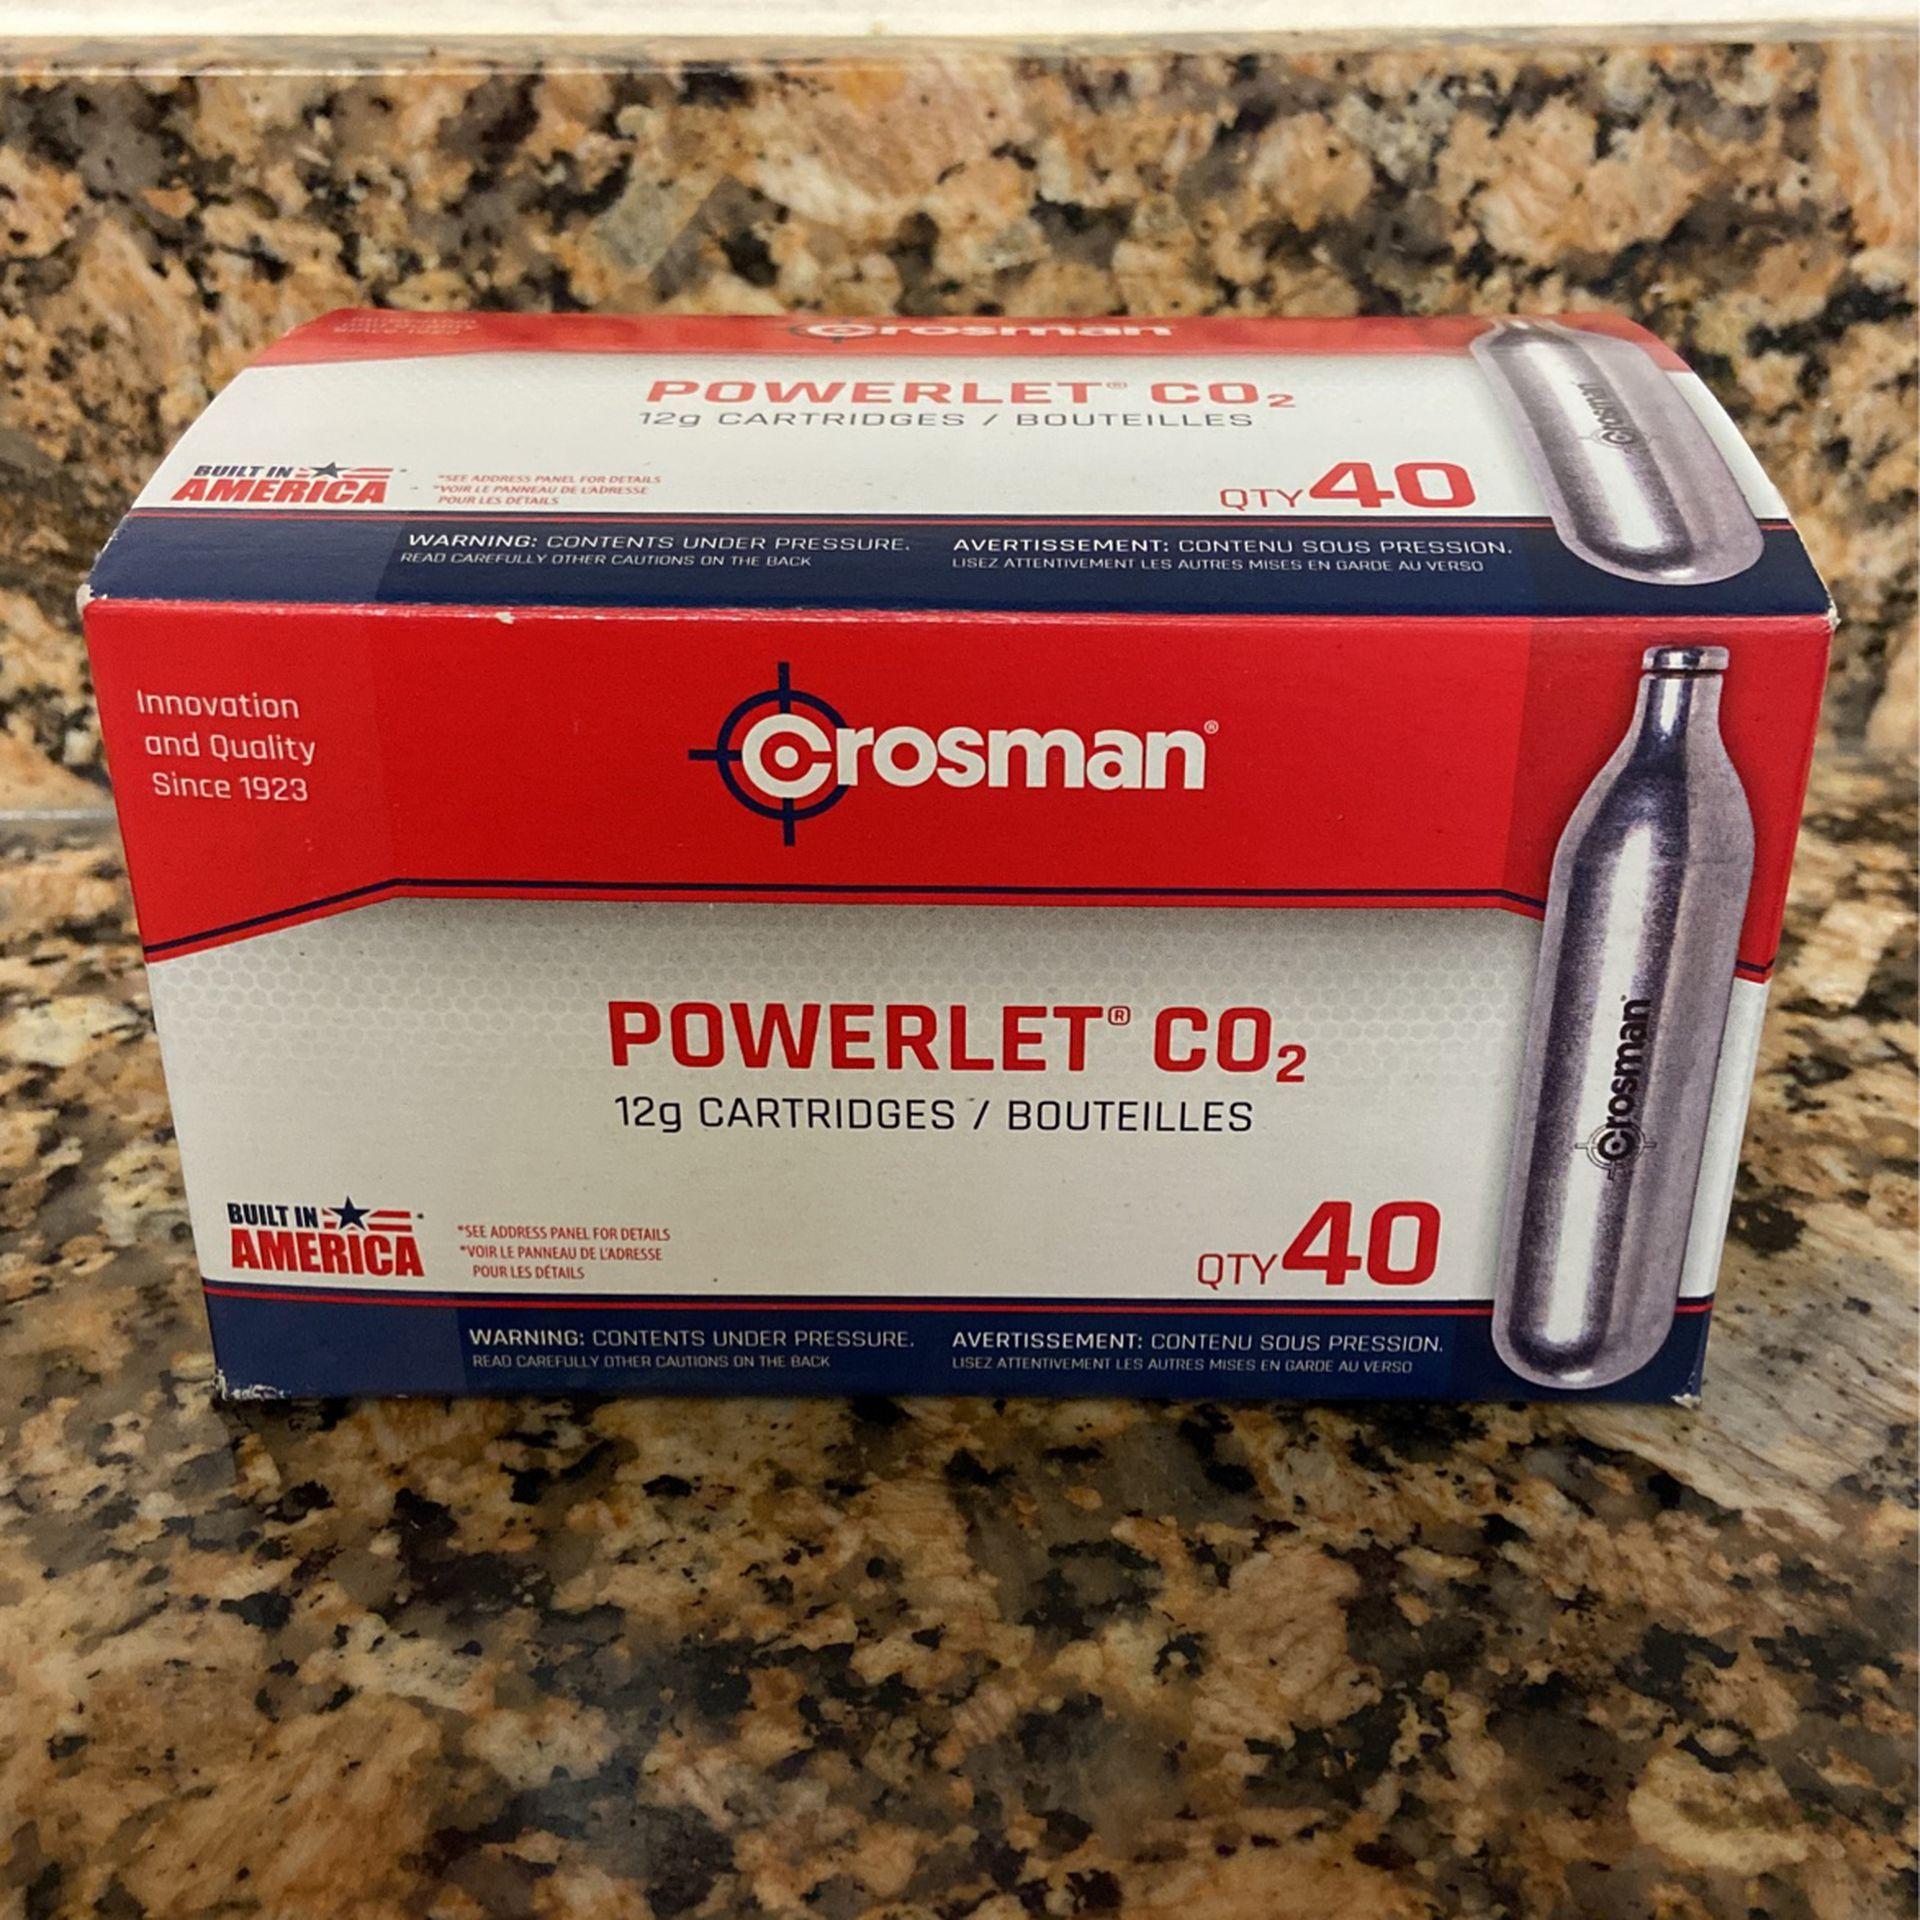 Crosman Powerlet CO2 12g Cartridges 40 Count